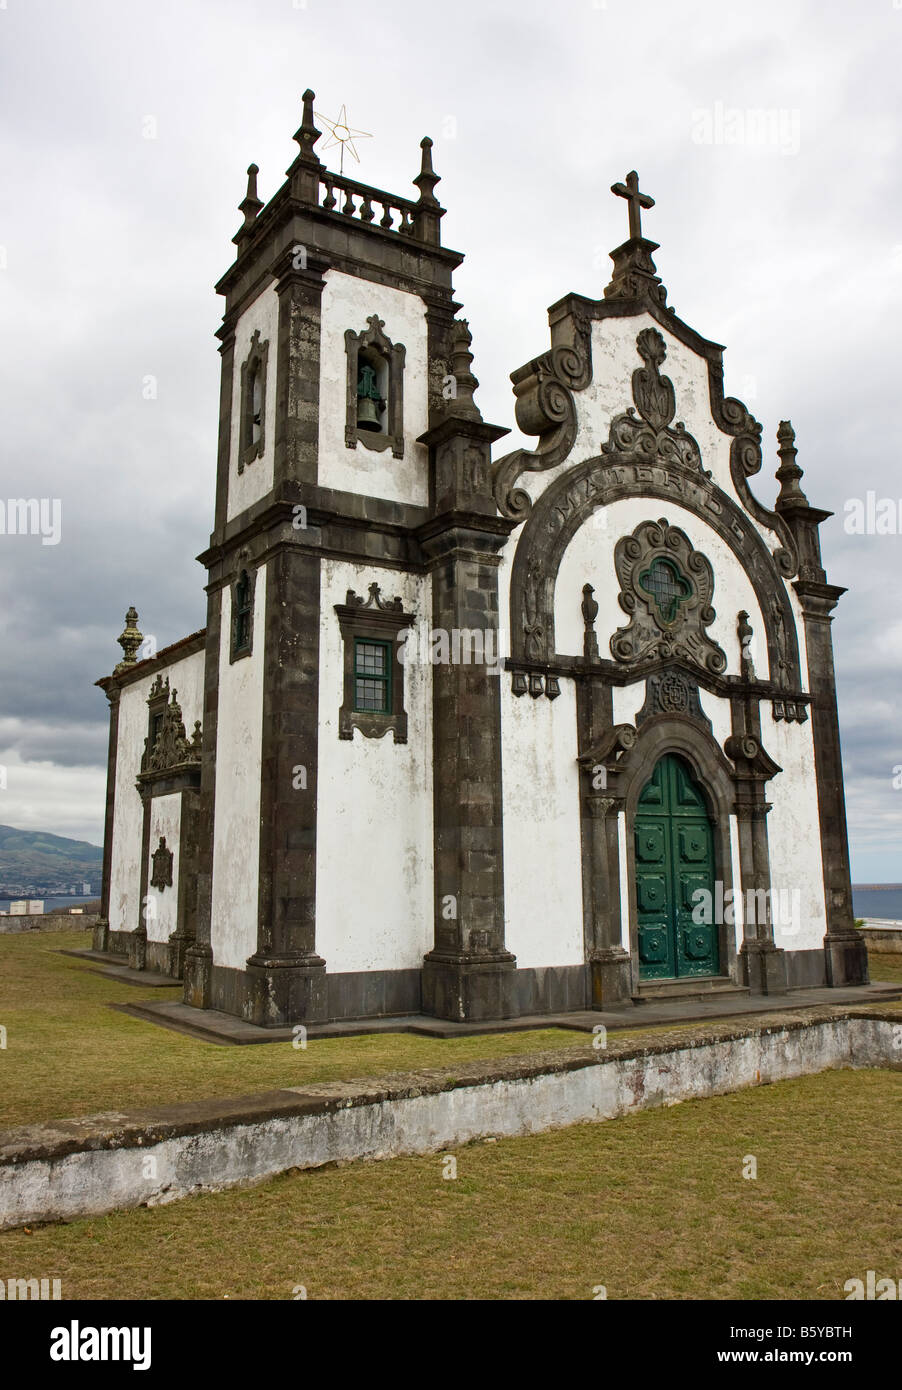 Mother of God Chapel, Ermida da Mãe de Deus, Ponta Delgada, Azores, Portugal - Stock Image